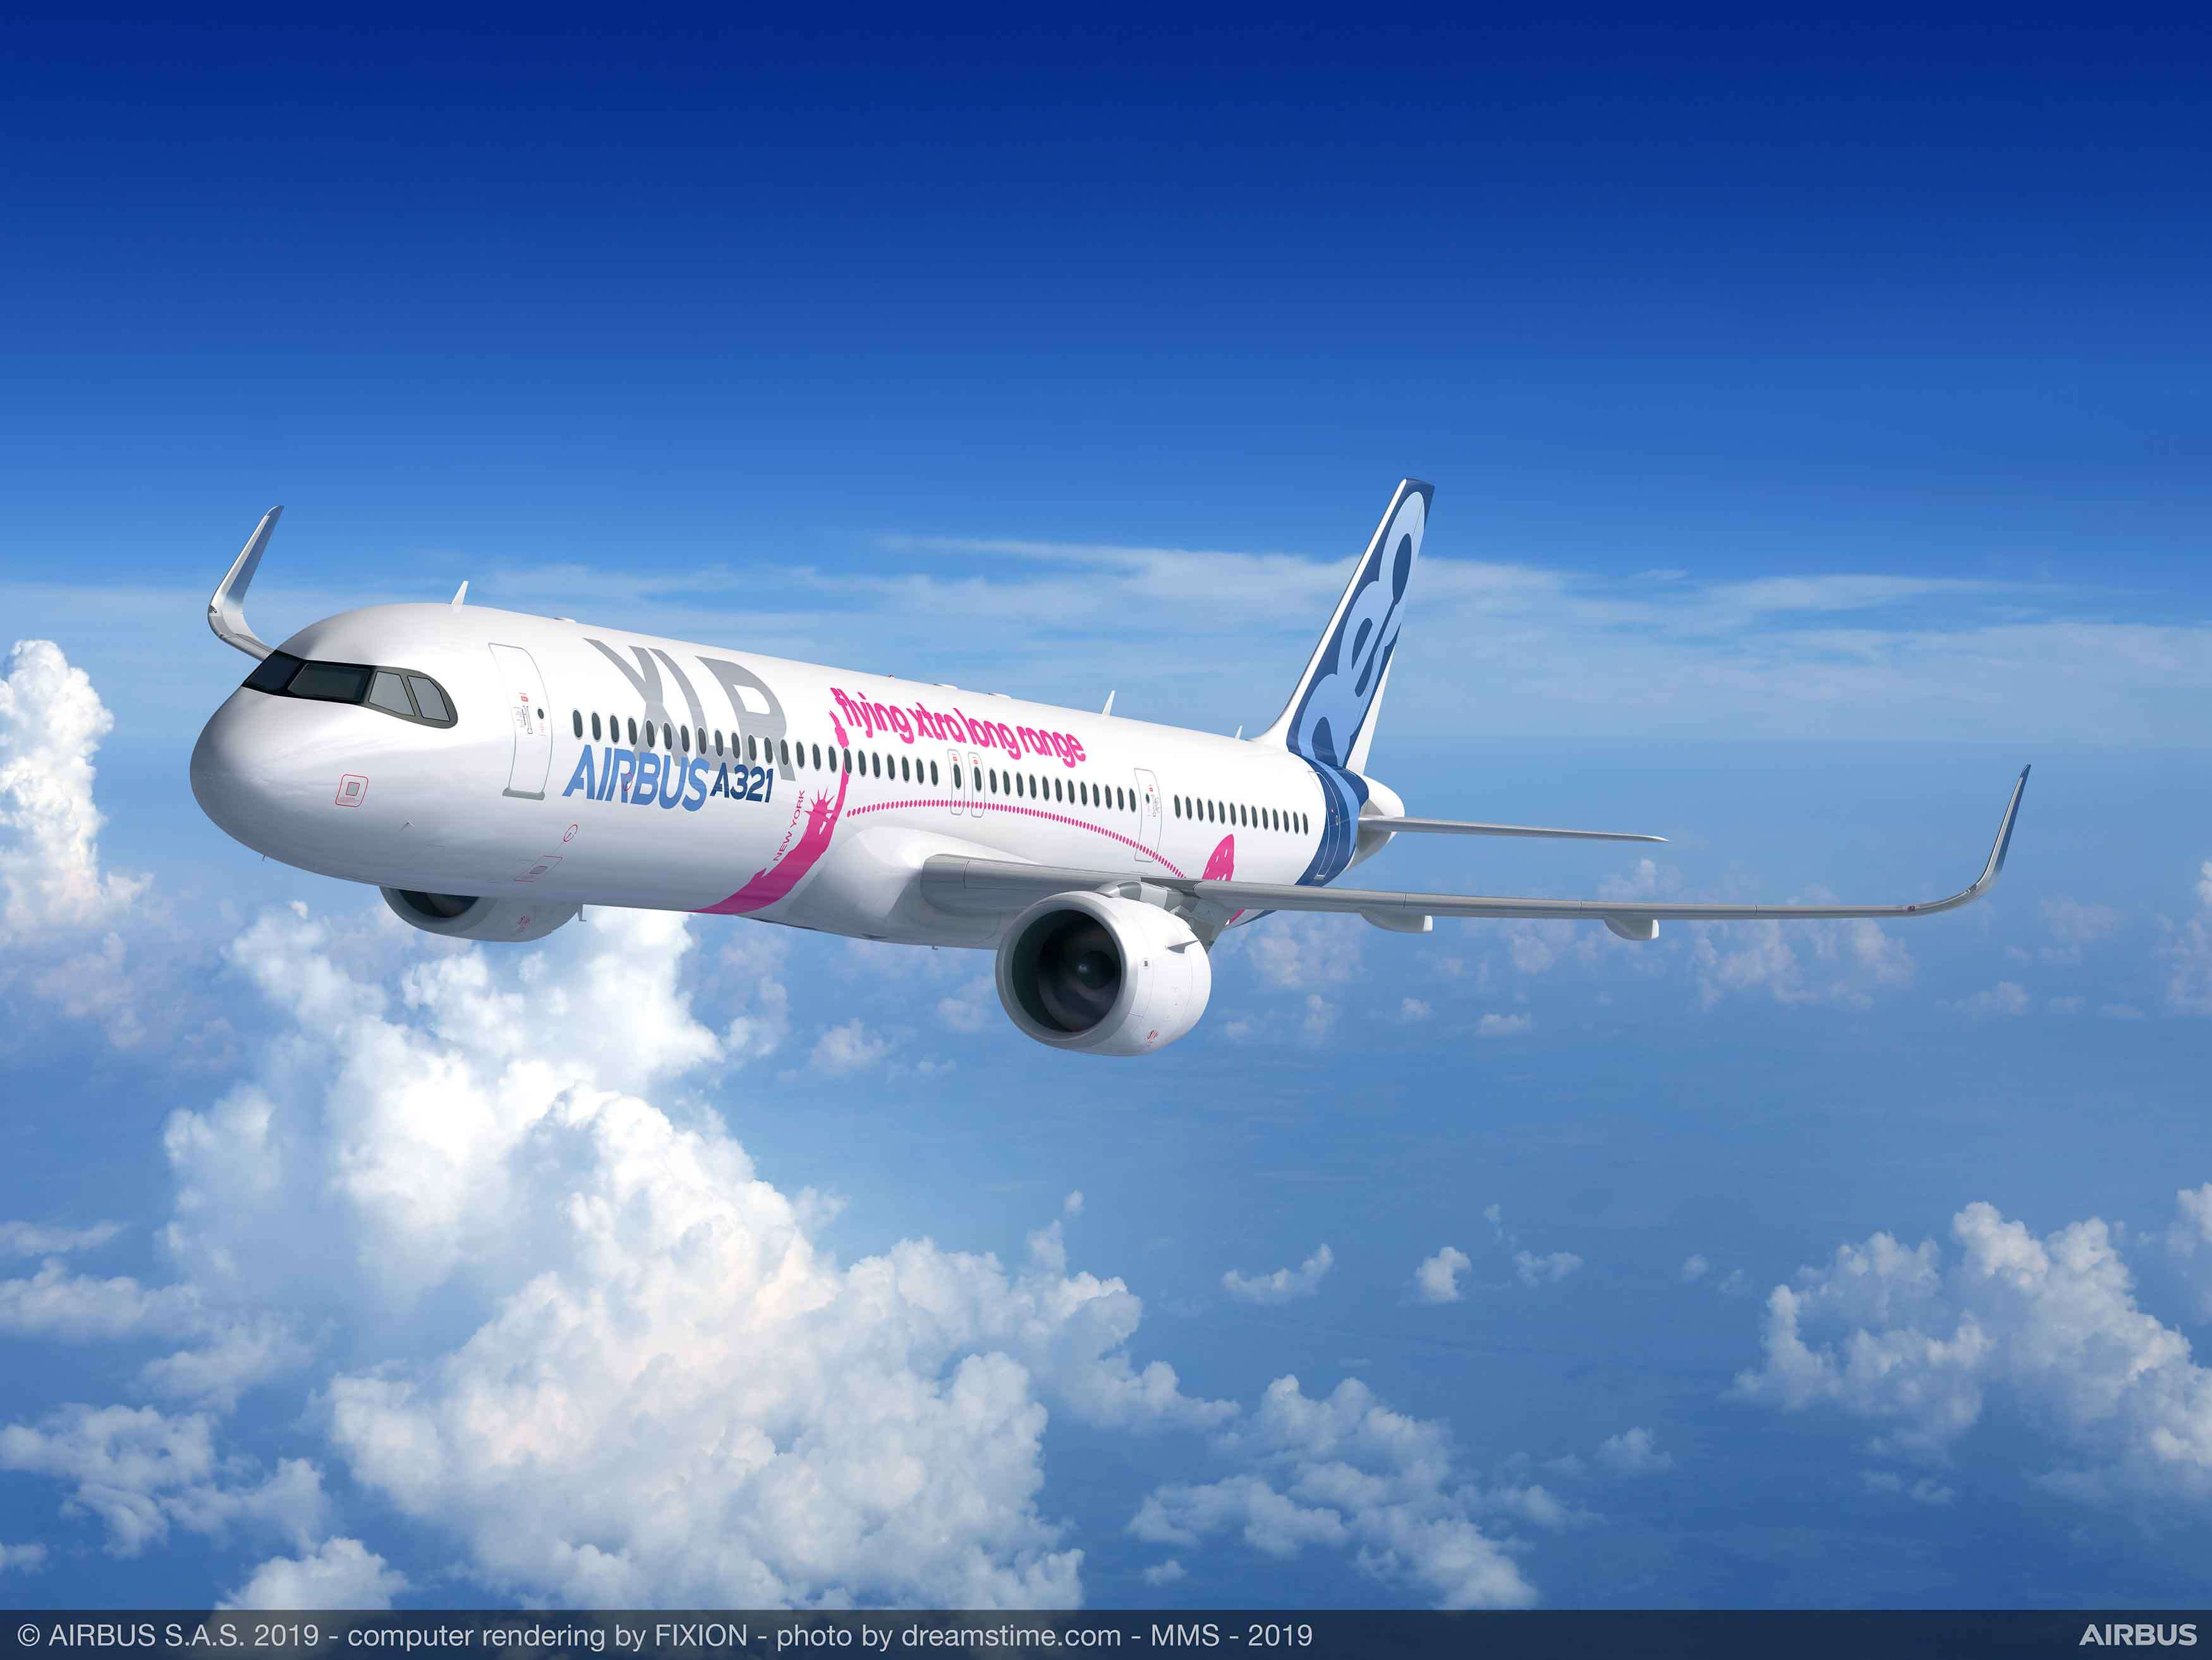 Airbus launches longest range single-aisle airliner: the A321XLR